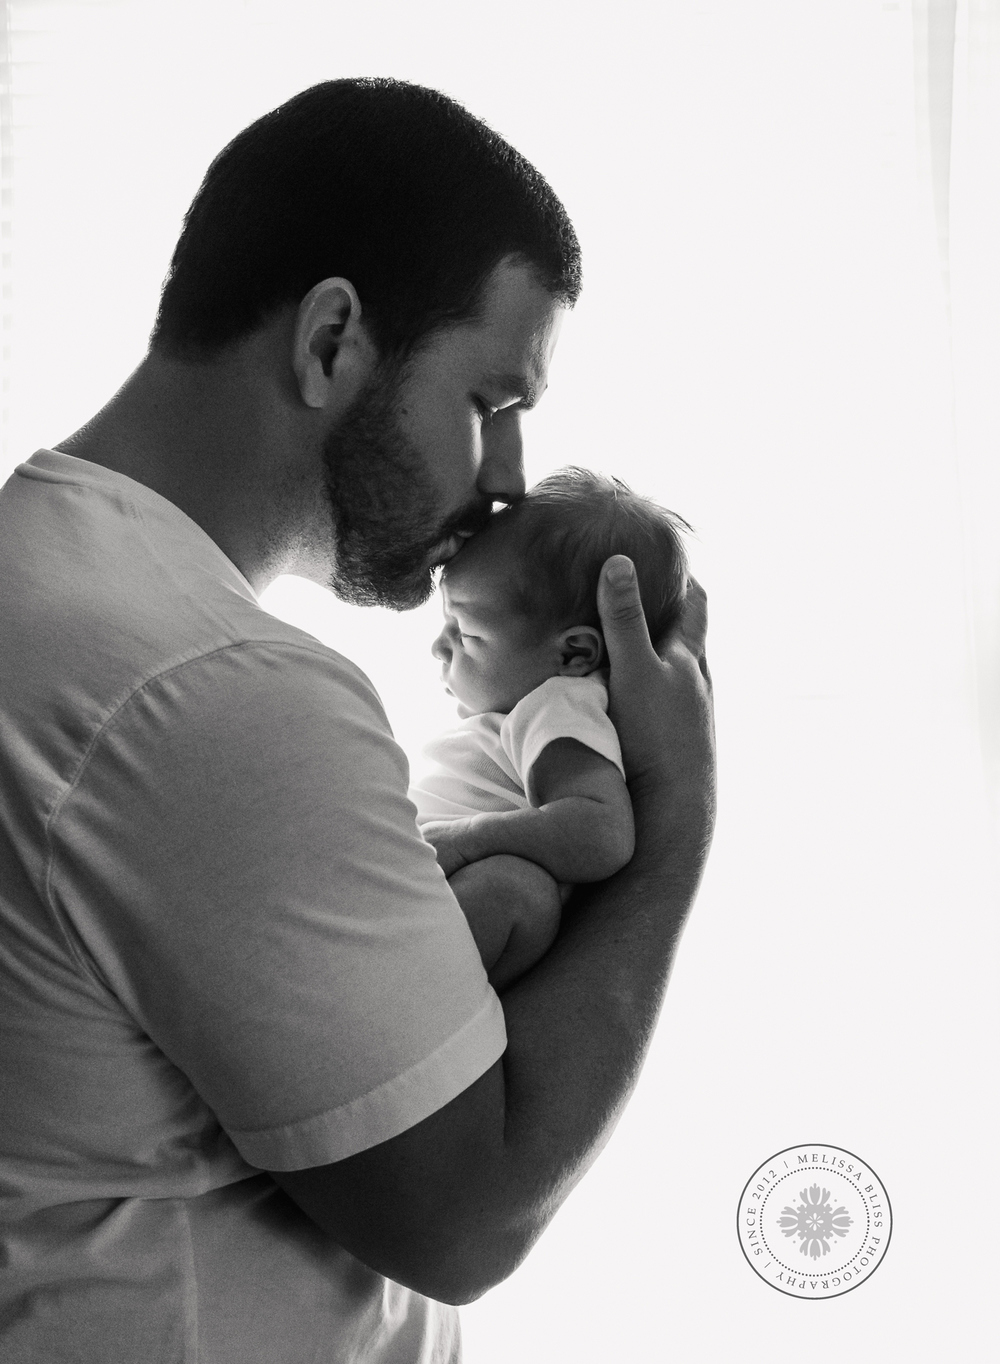 virginia-beach-documentary-newborn-photographer-norfolk-newborn-photographer-chesapeake-newborn-photographer-williamsburg-newborn-photographer-melissa-bliss-photography